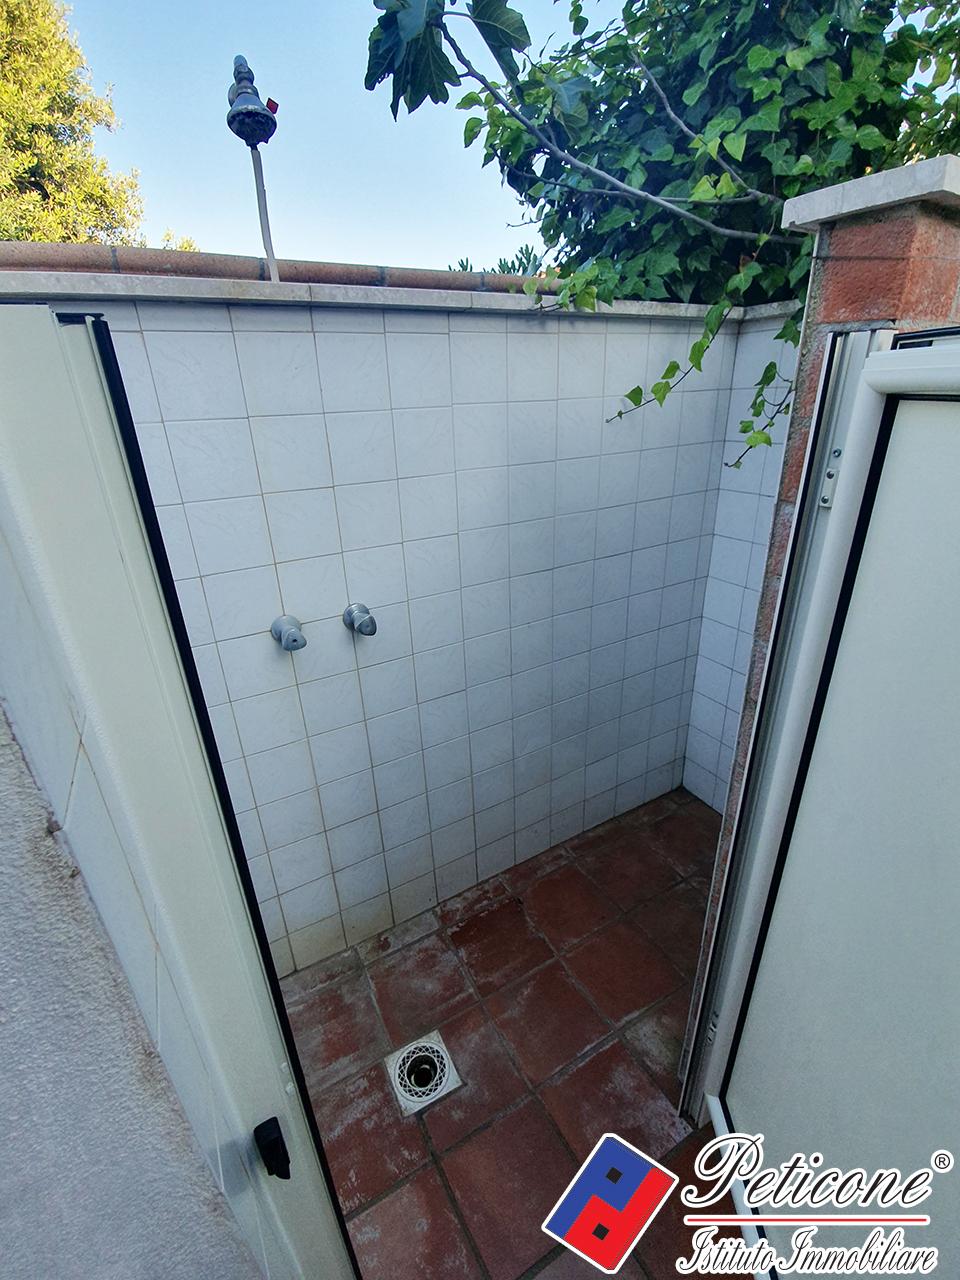 Villa in Vendita a Fondi: 4 locali, 50 mq - Foto 12